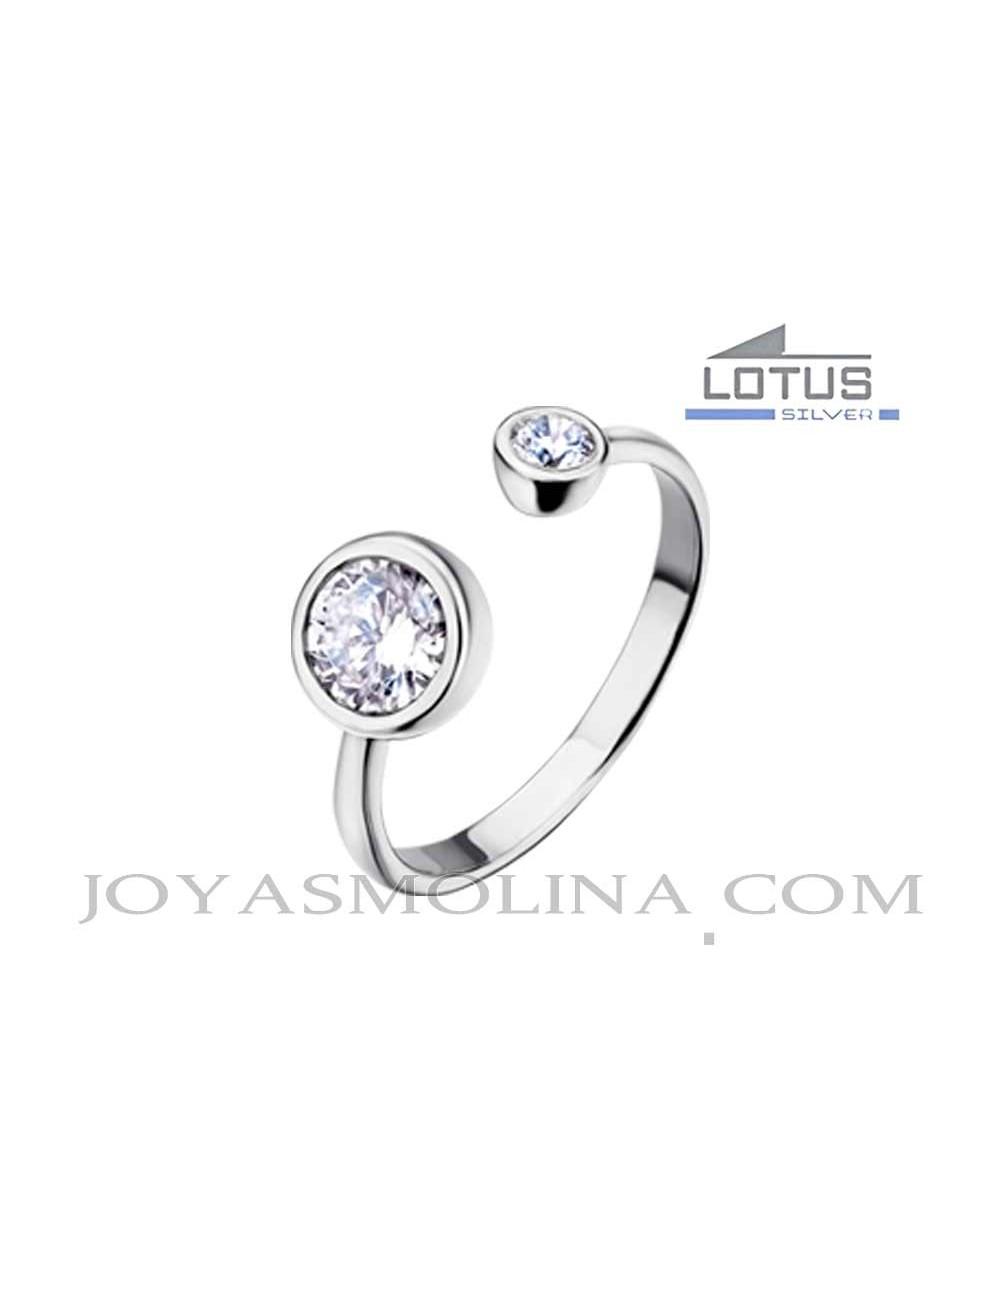 Anillo Lotus Silver ajustable plata circonitas